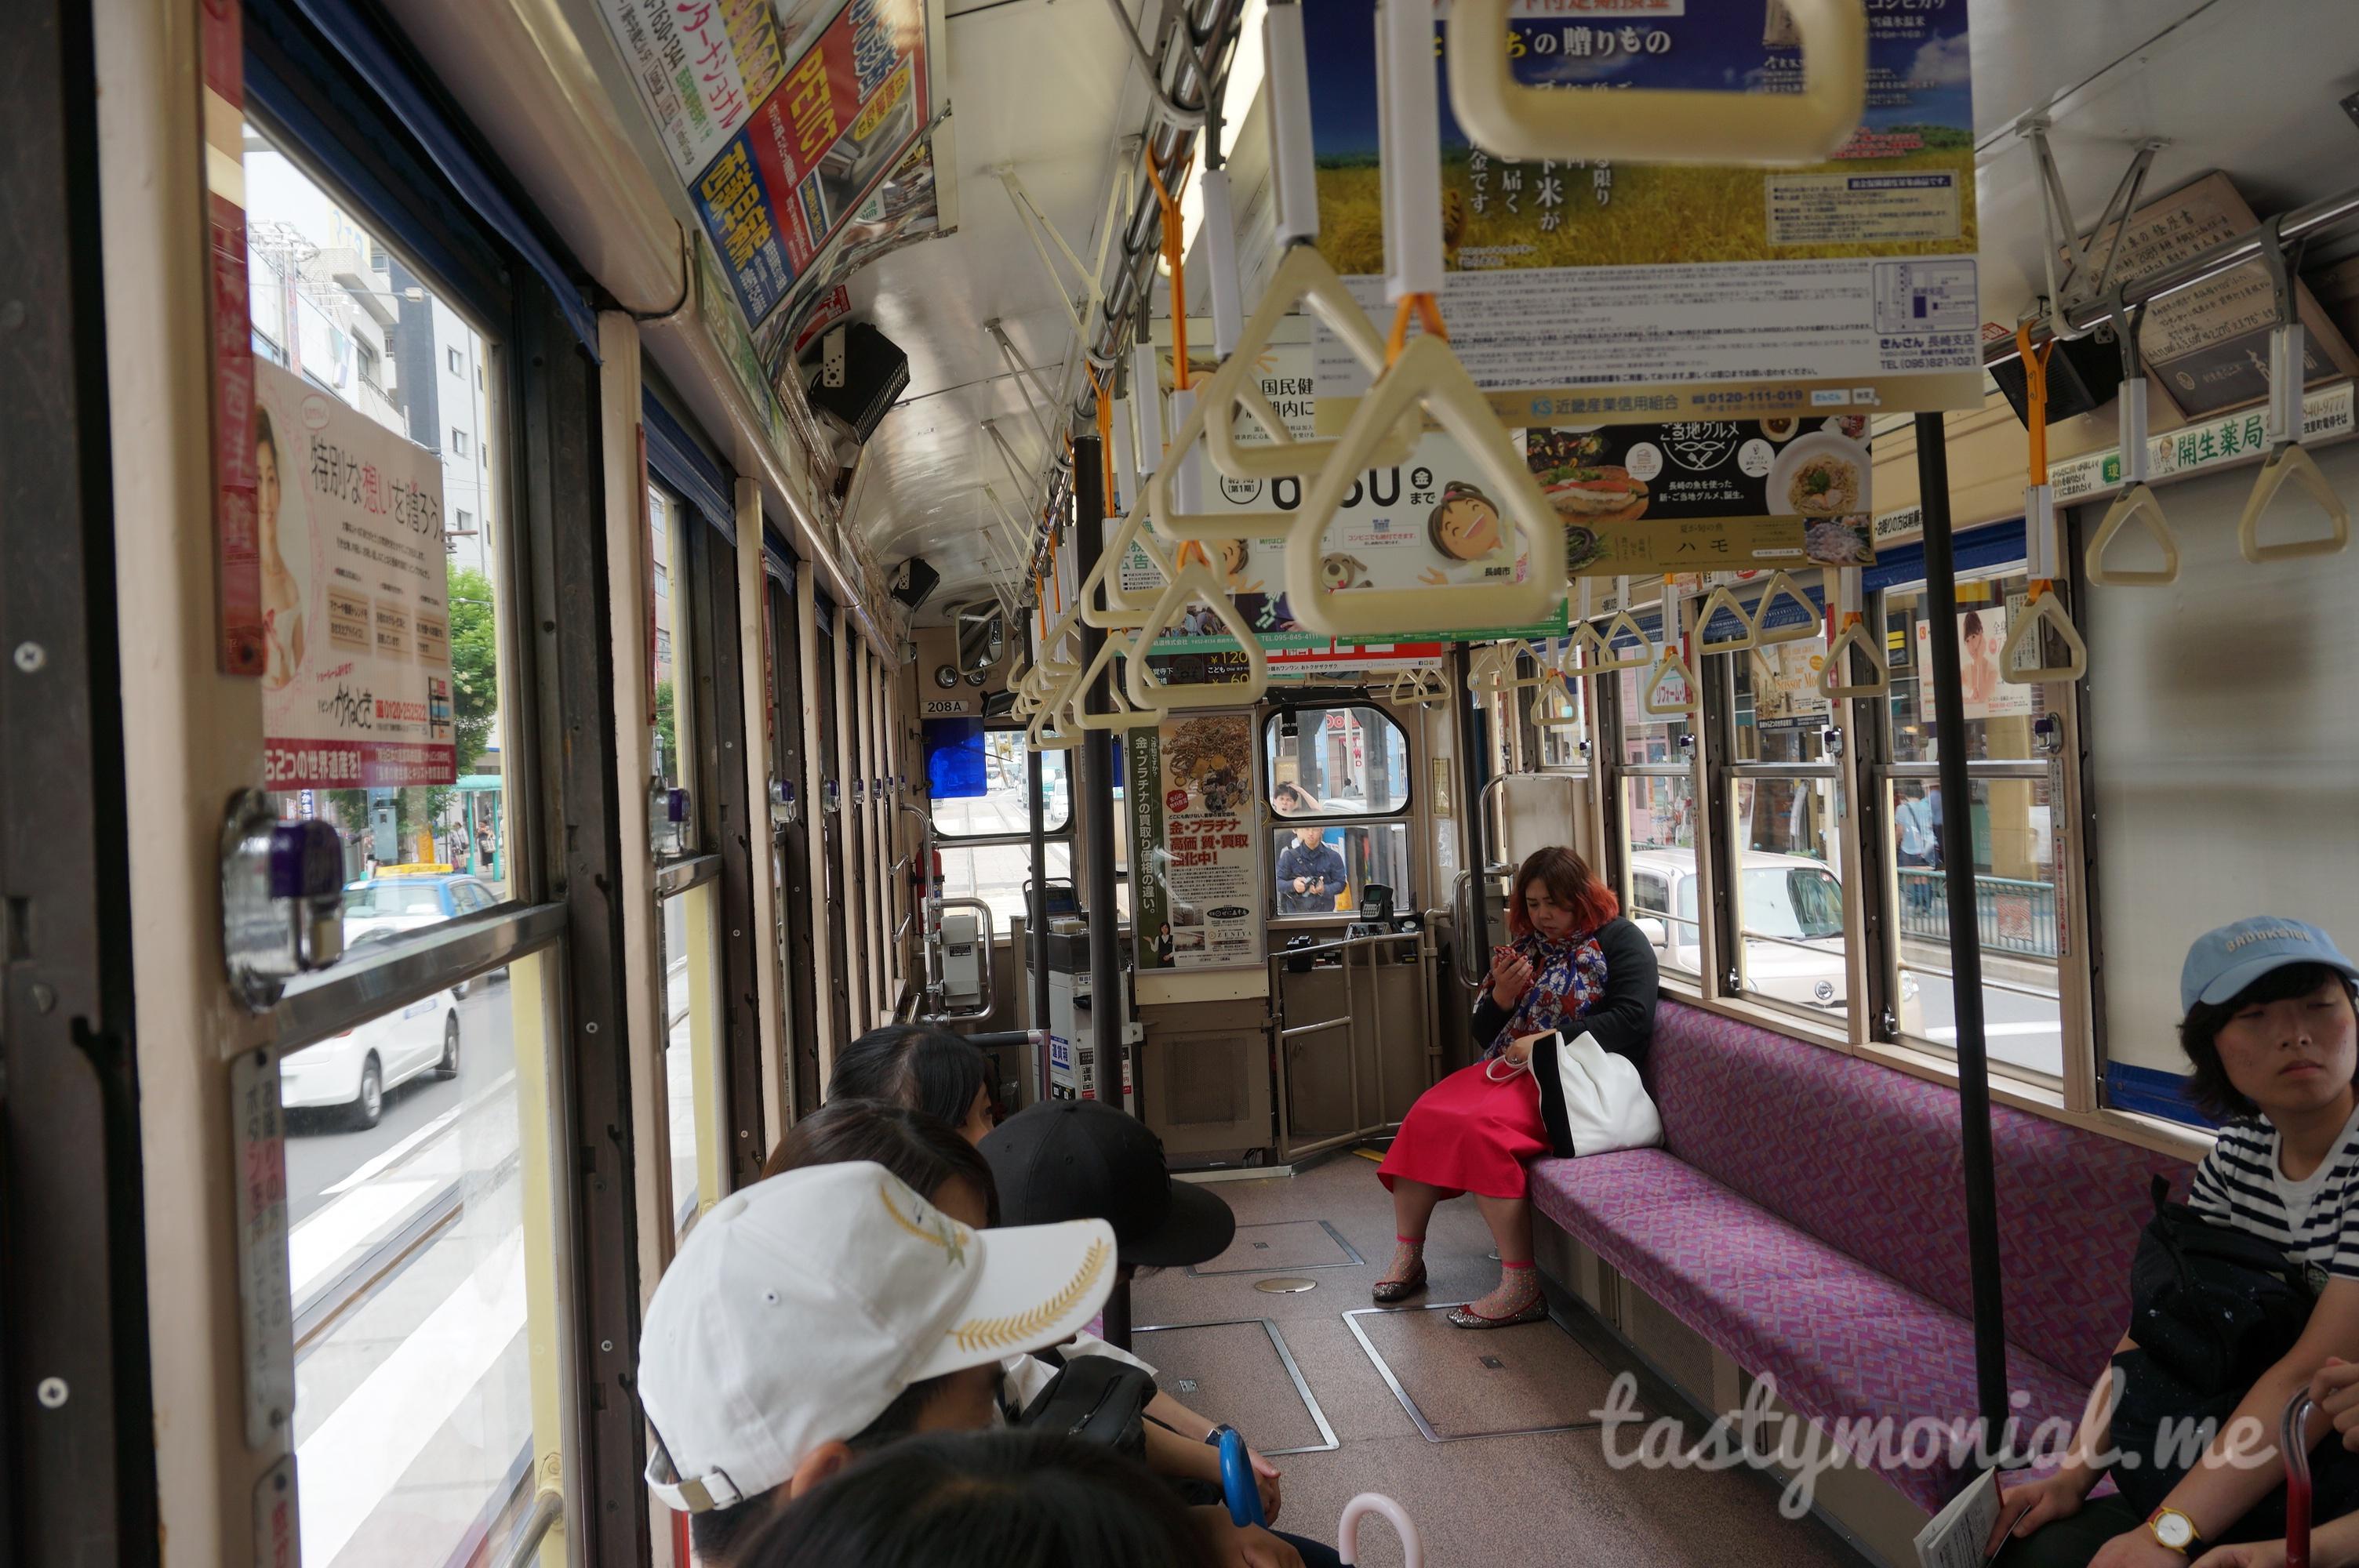 Inside a Nagasaki Tram